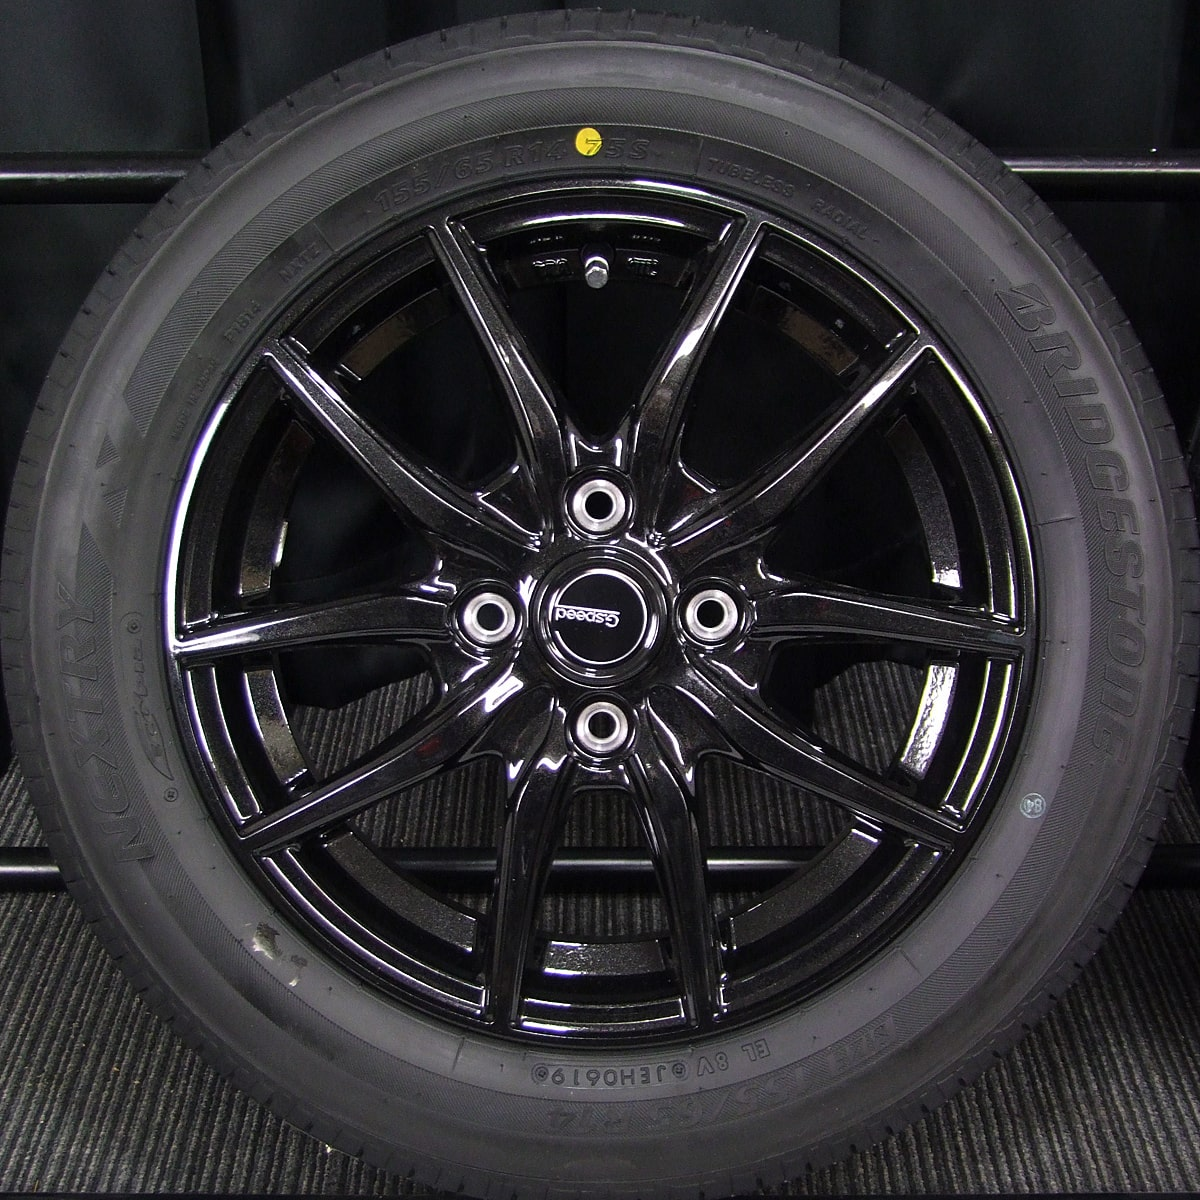 HOT STUFF G.speed G-02 ブラックメタリック BRIDGESTONE NEXTRY 155/65R14 4本SET